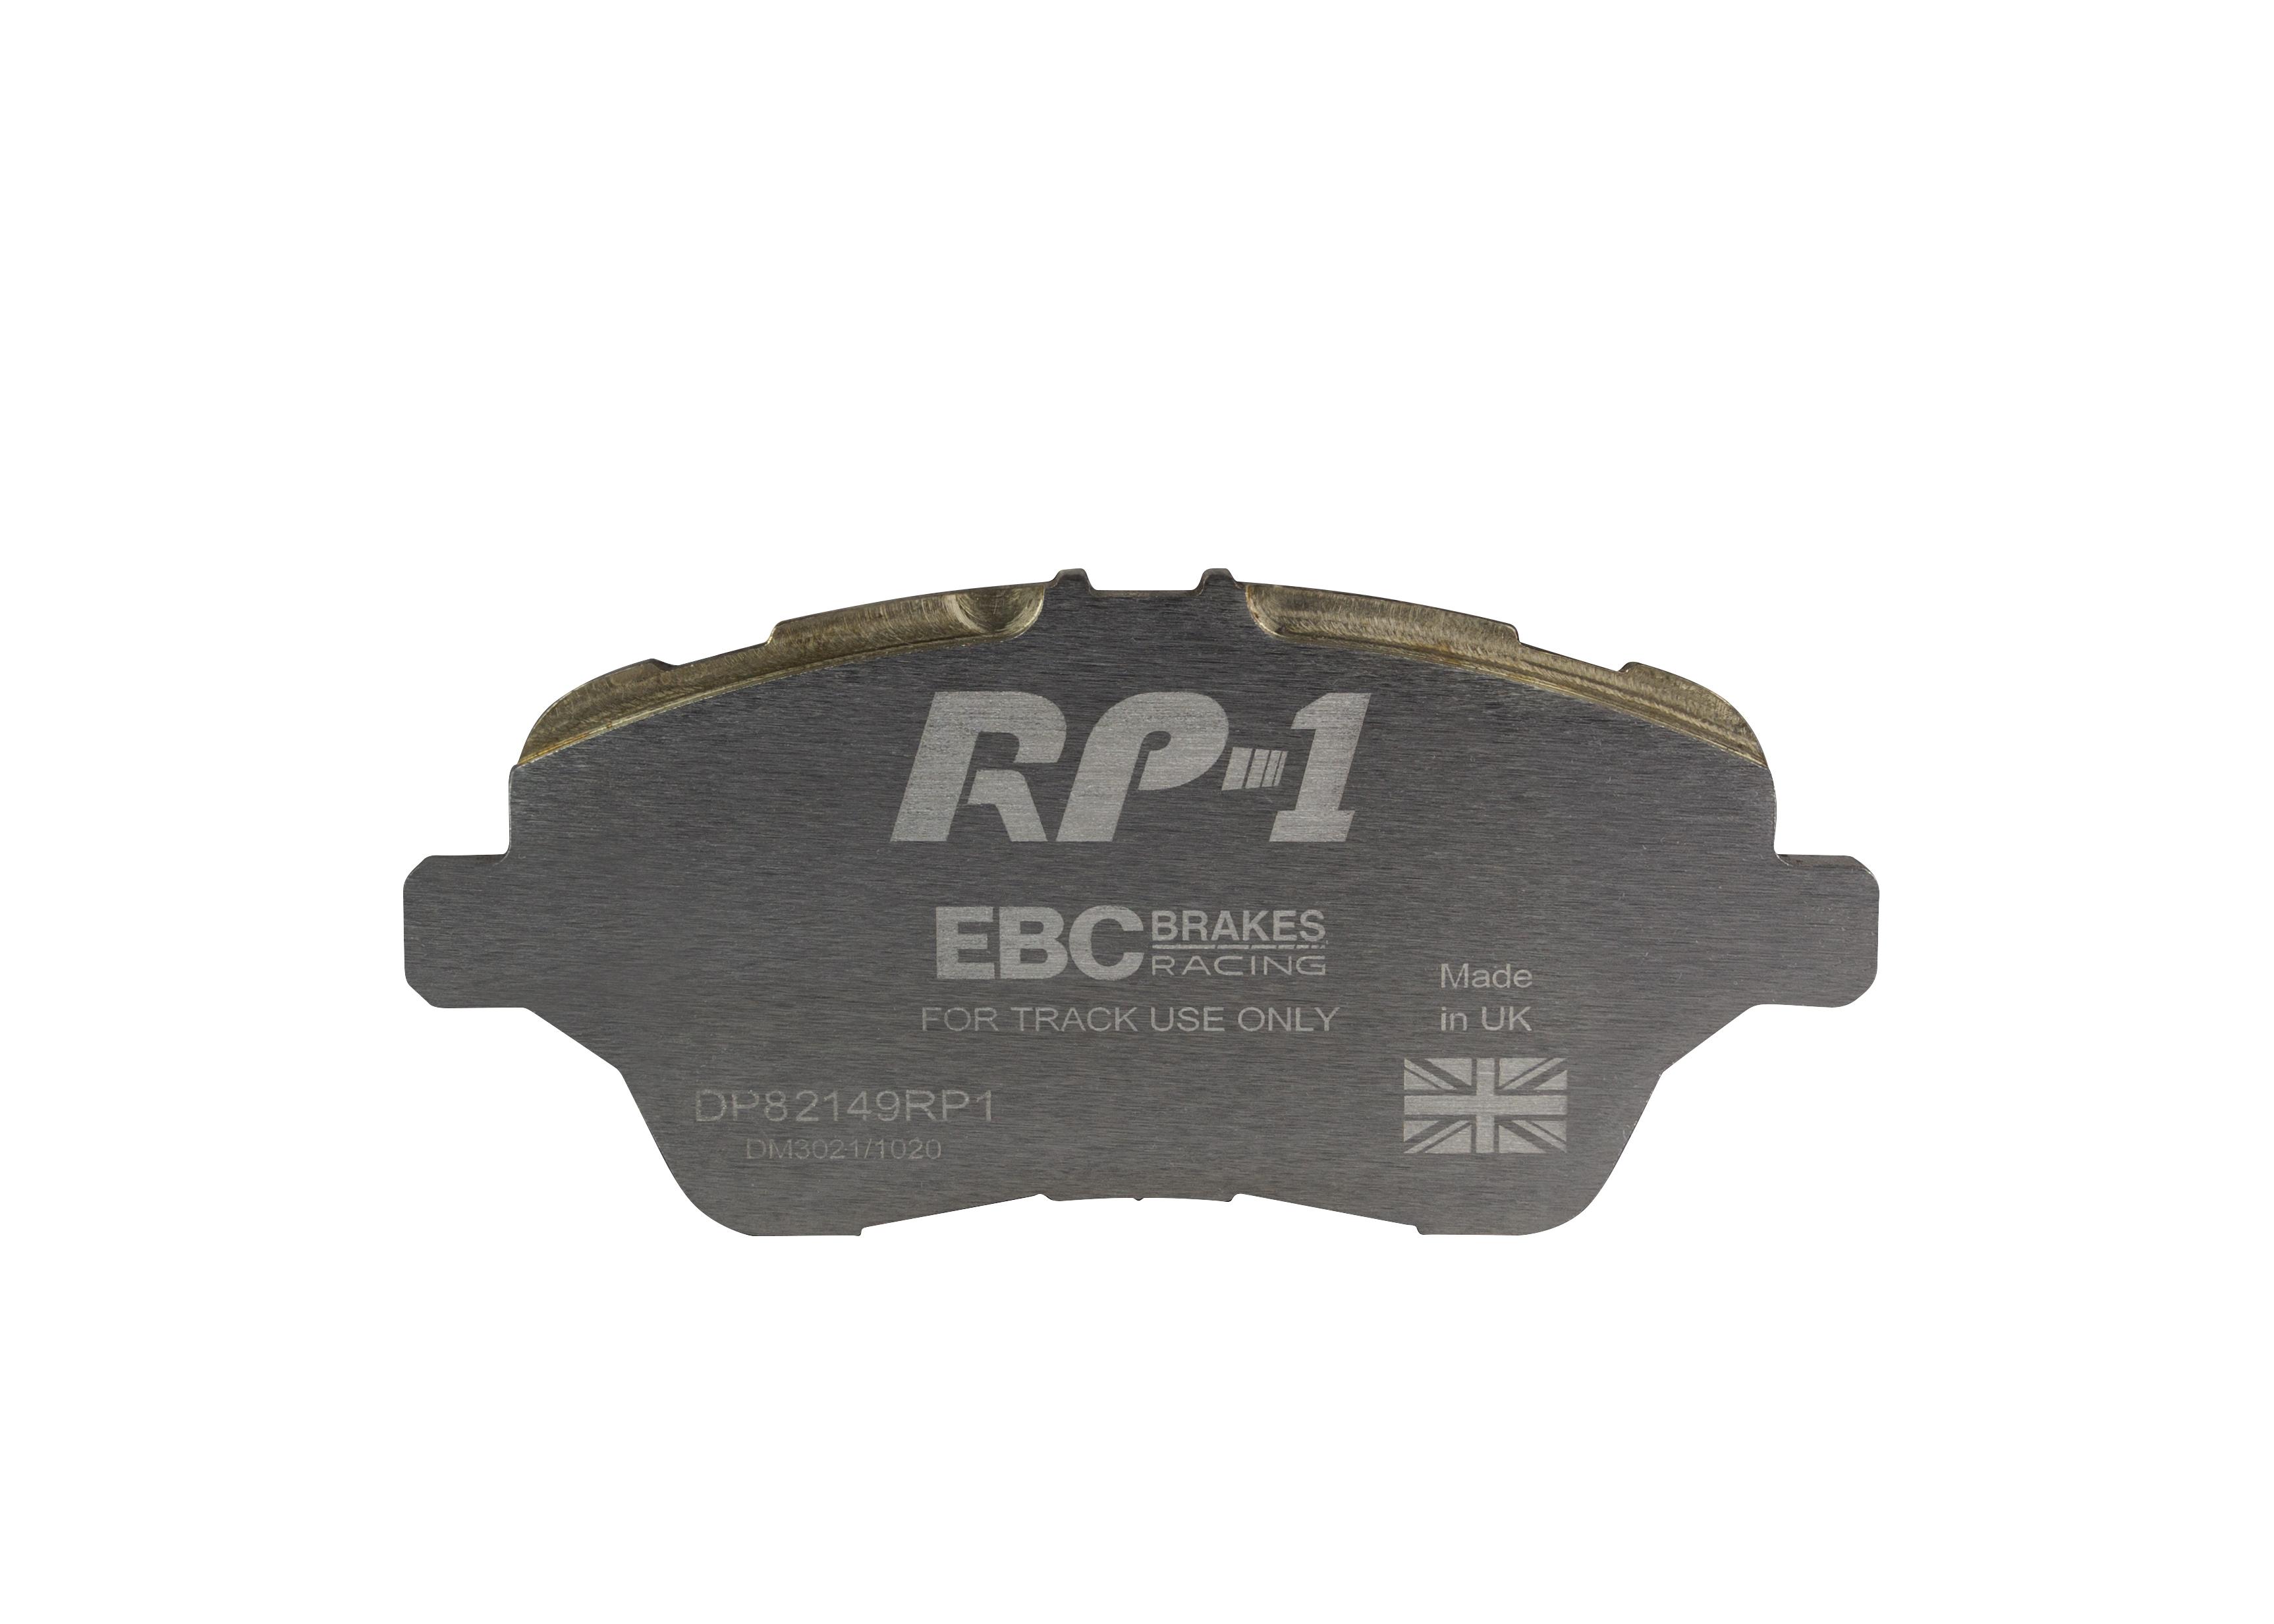 EBC USR Slotted Rear Brake Discs For Ford Fiesta Mk7 ST180 1.6 Turbo USR280